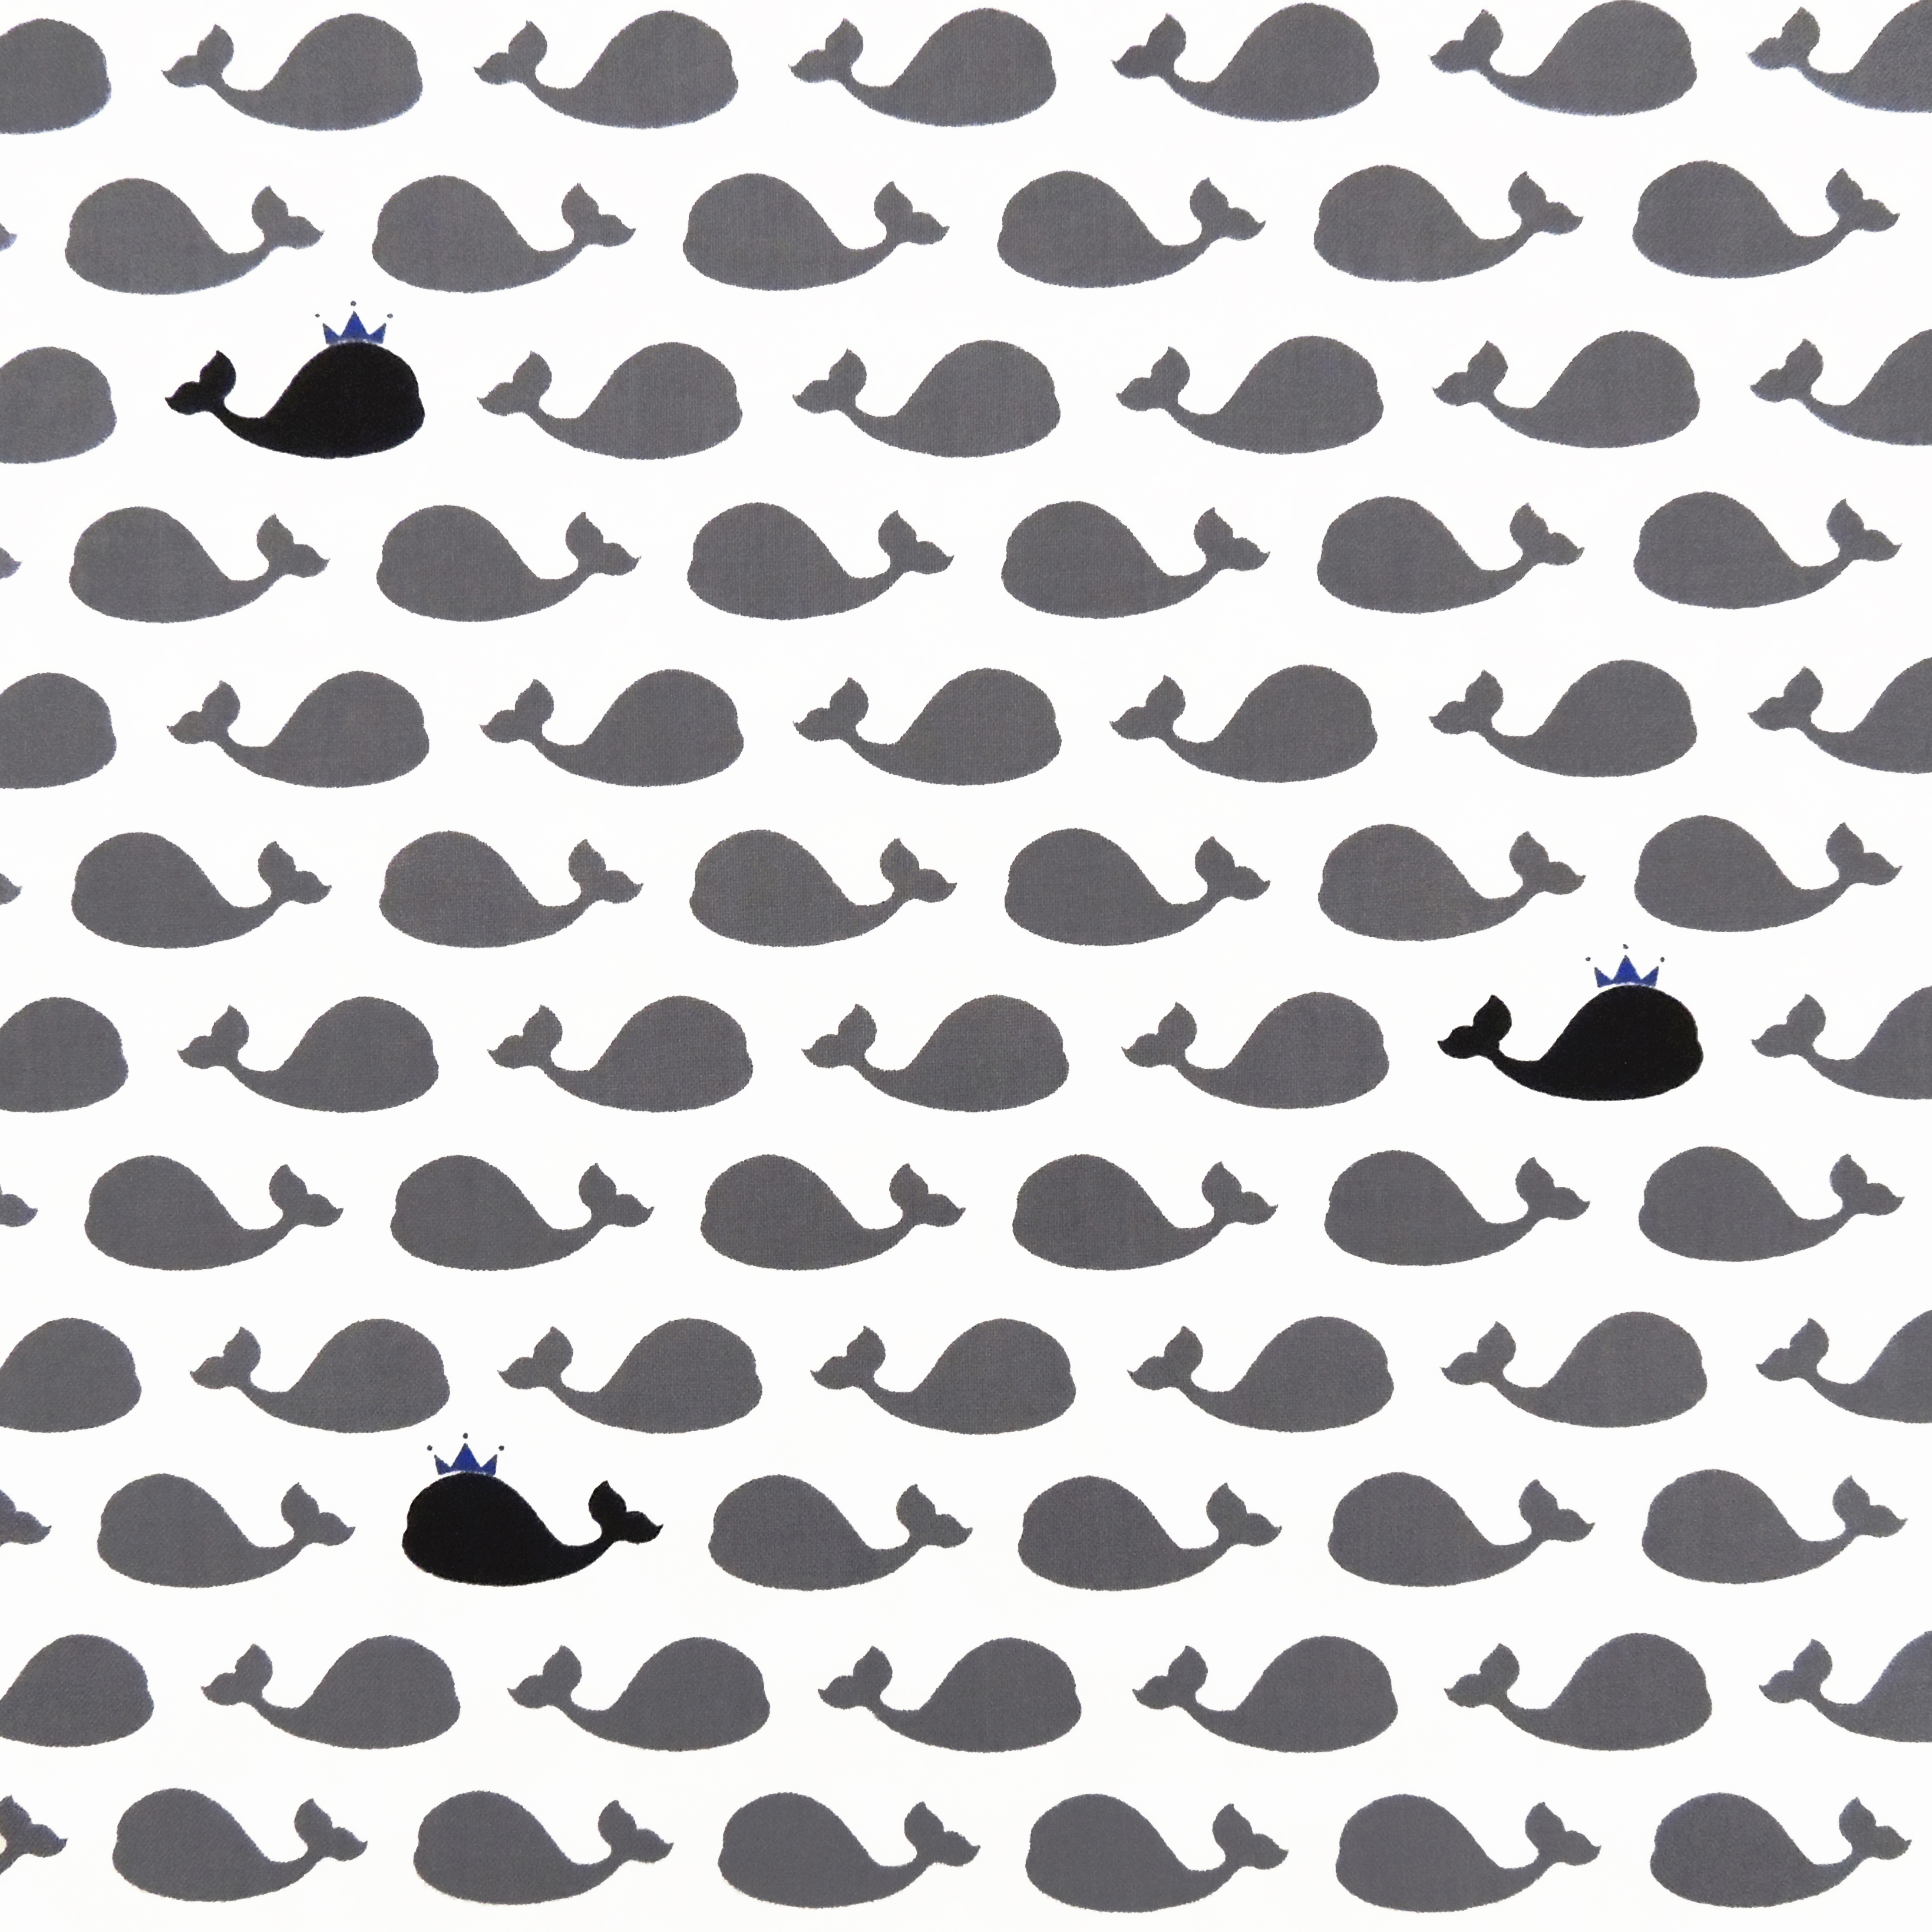 Ткань серые кашалоты - студия SOVA